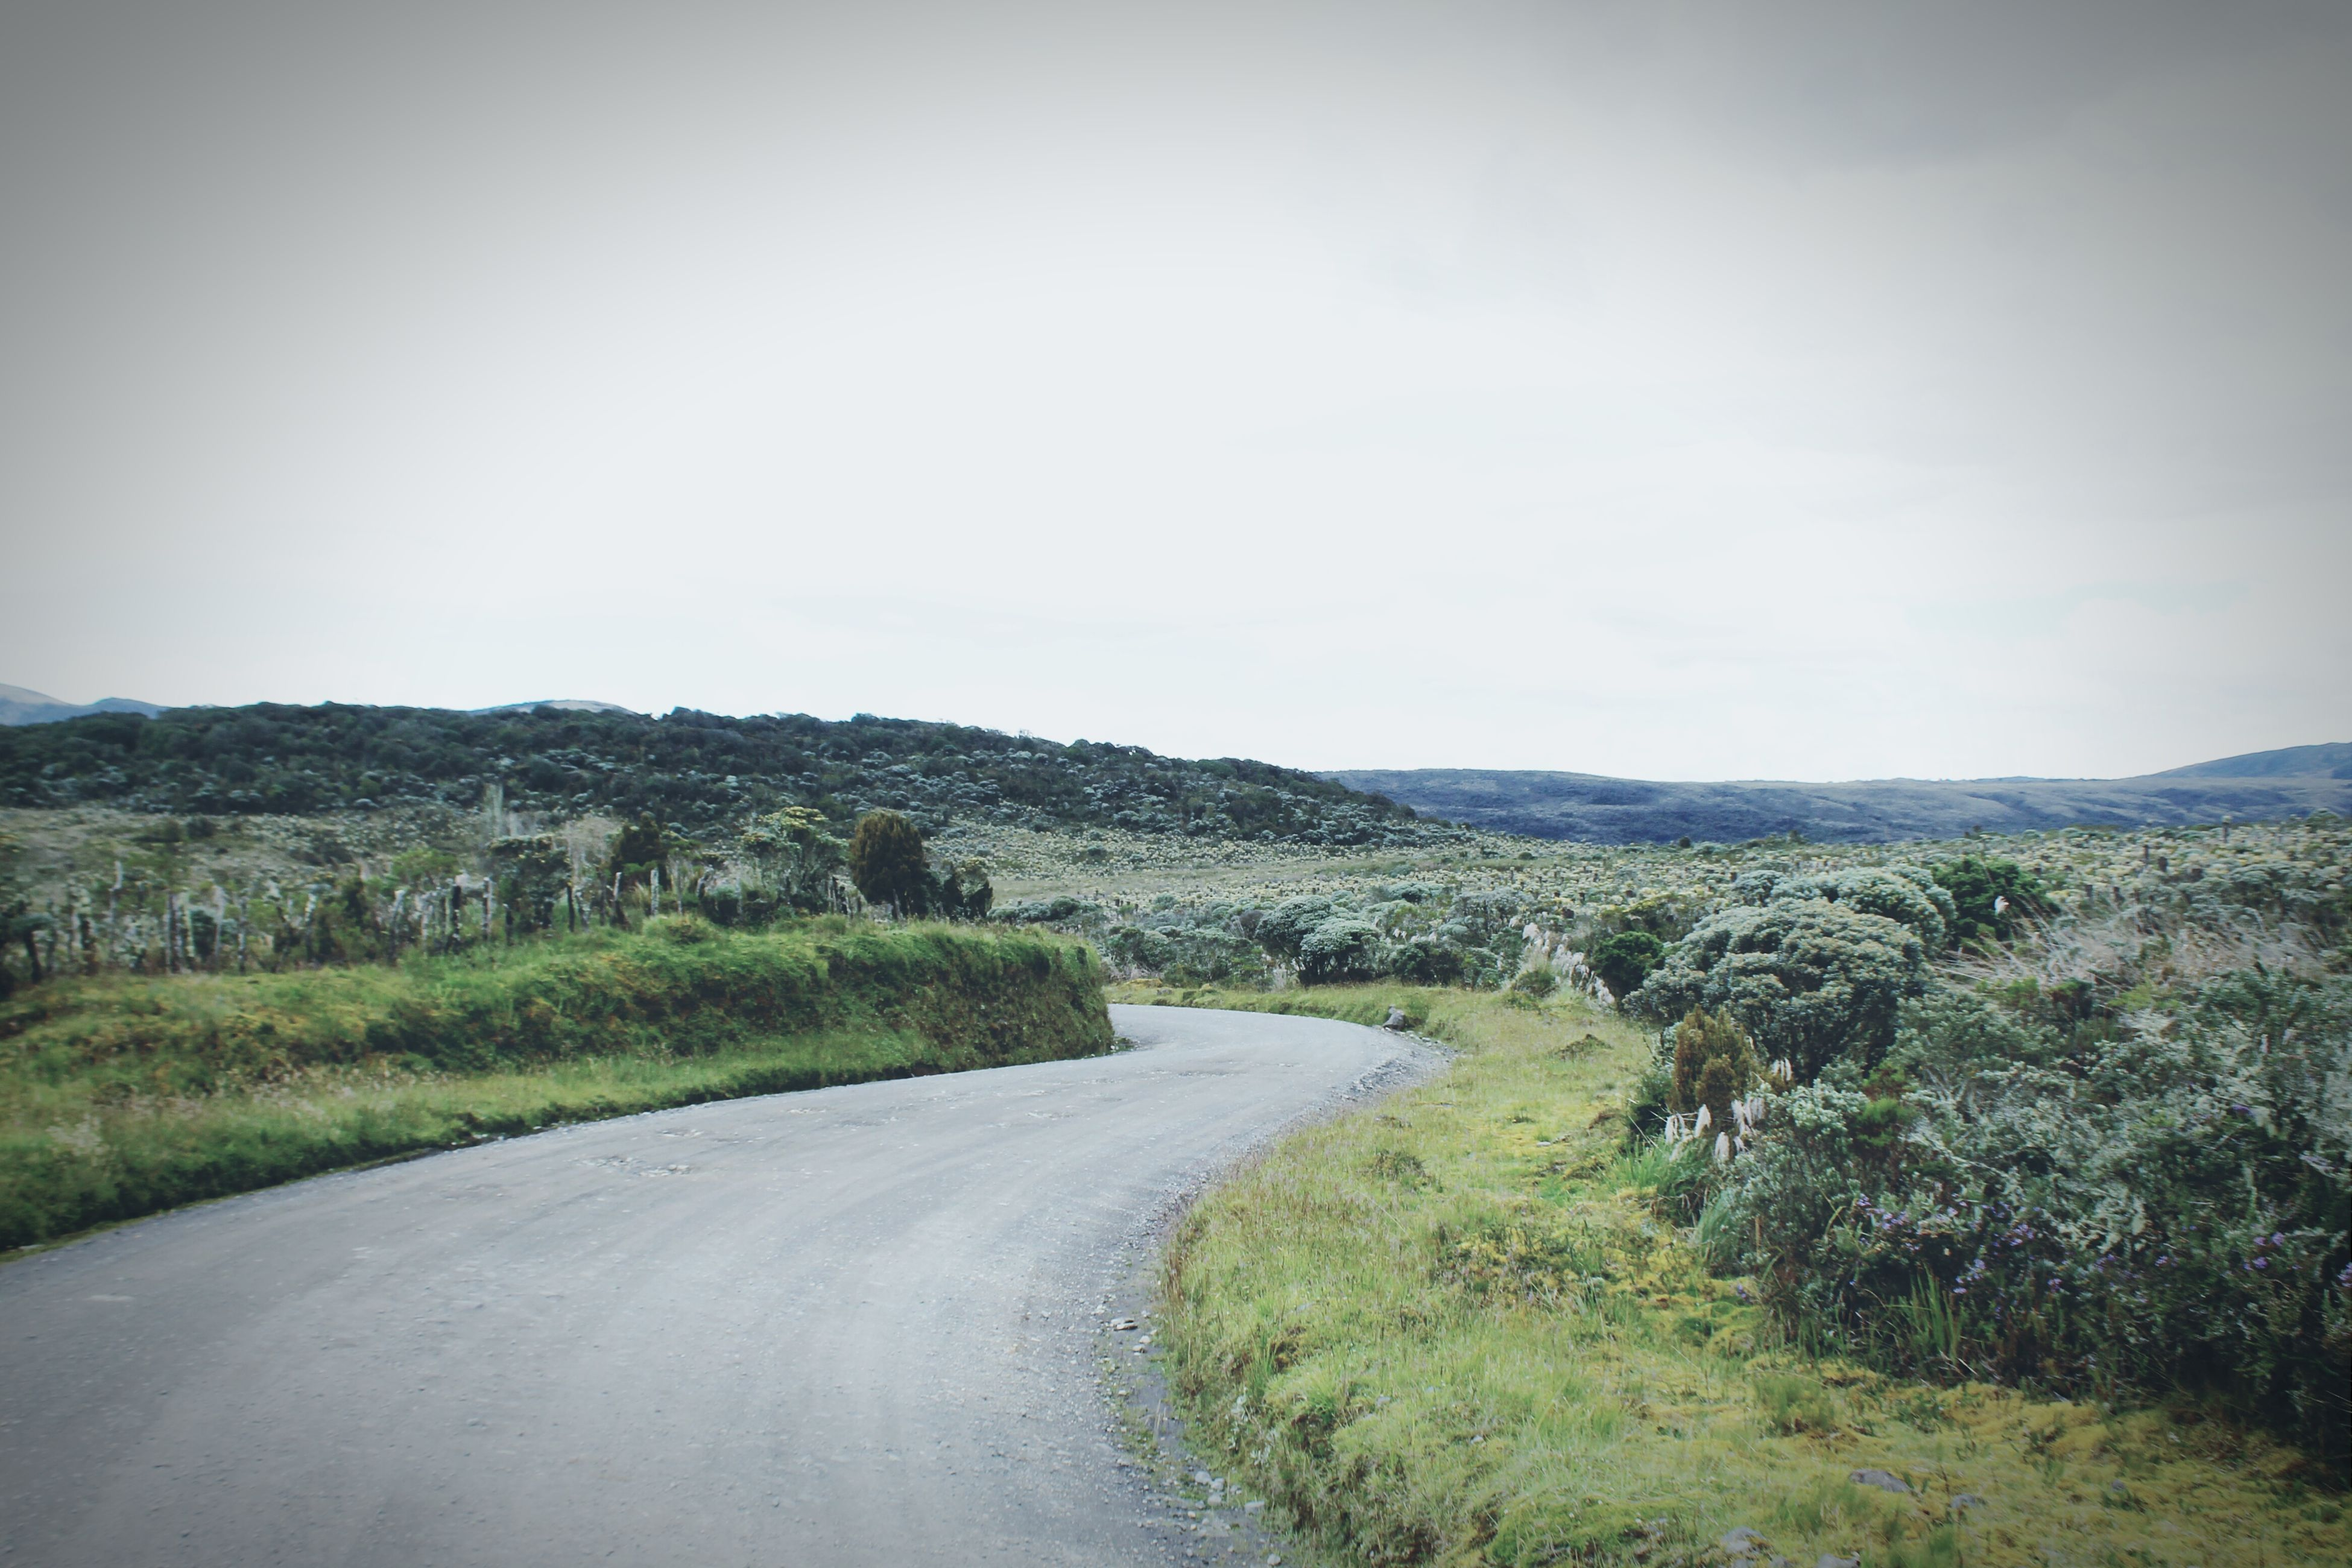 Vanishing Point Colombia Roadtrip Traveling Pnpurace Volcan Purace Páramo